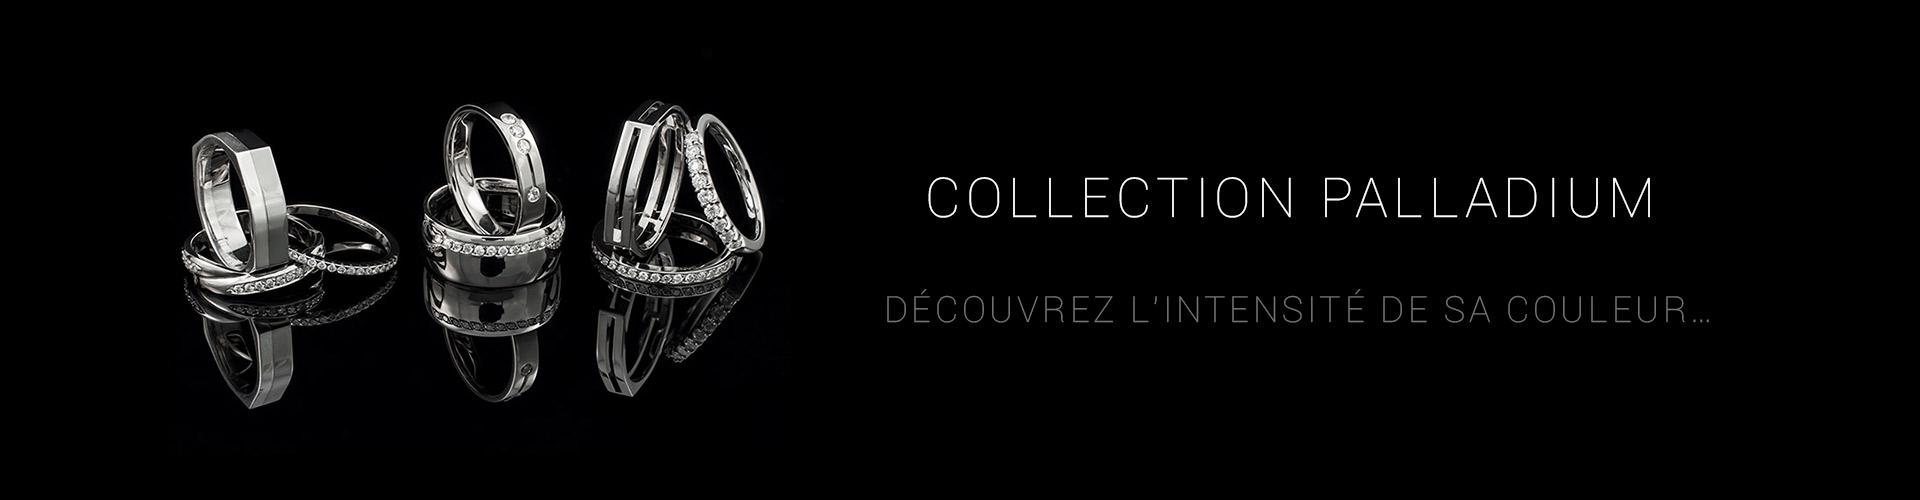 Collection Palladium Bijoux haut de gamme